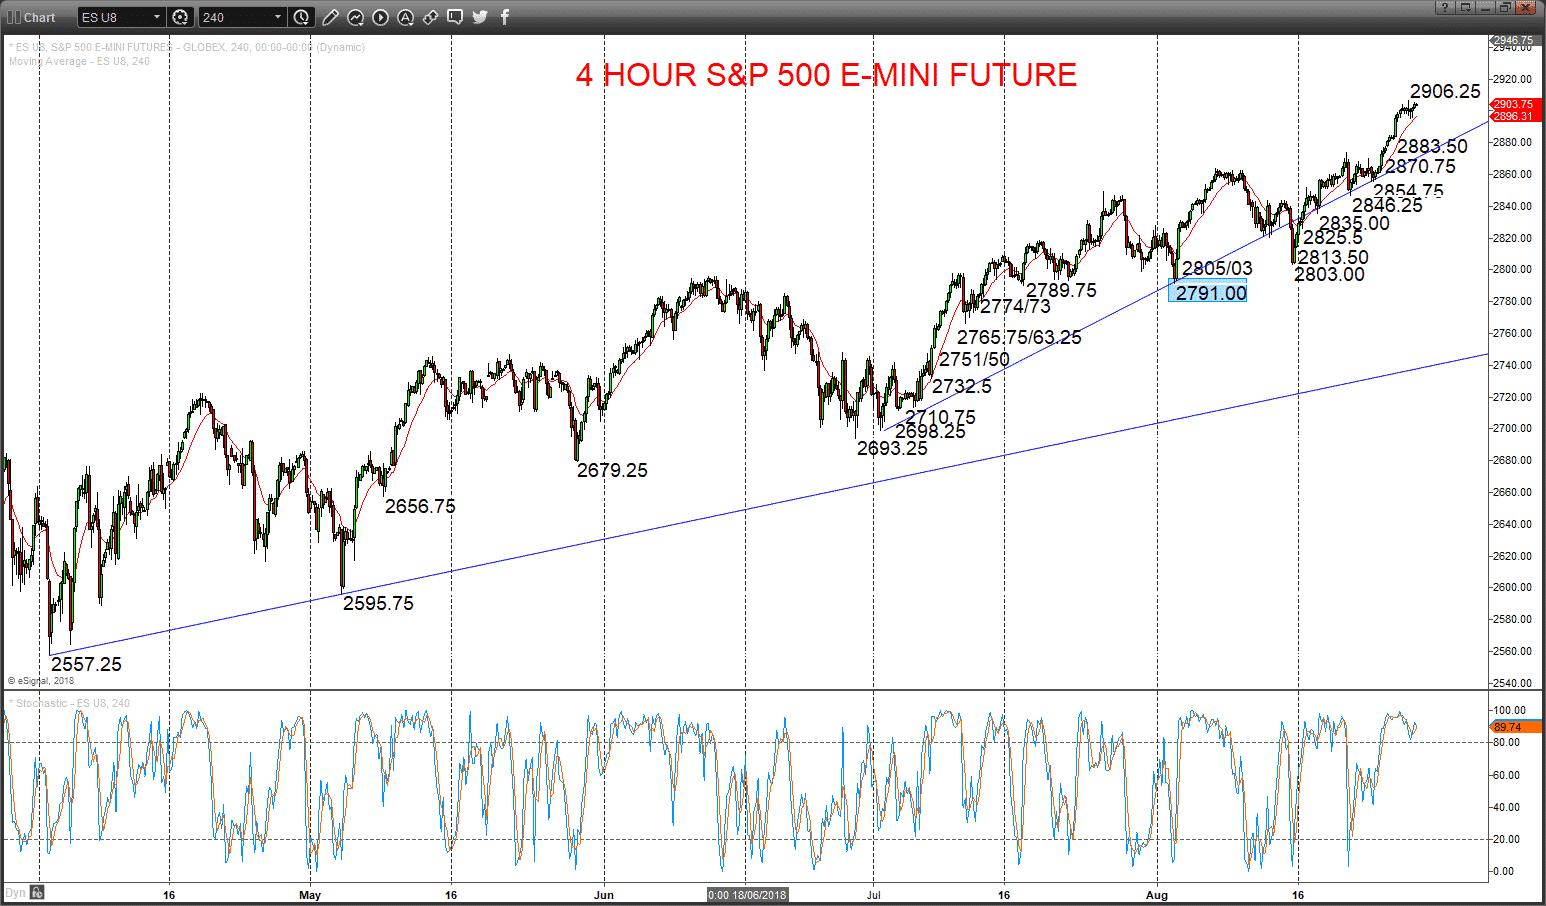 4 hour S&P 500